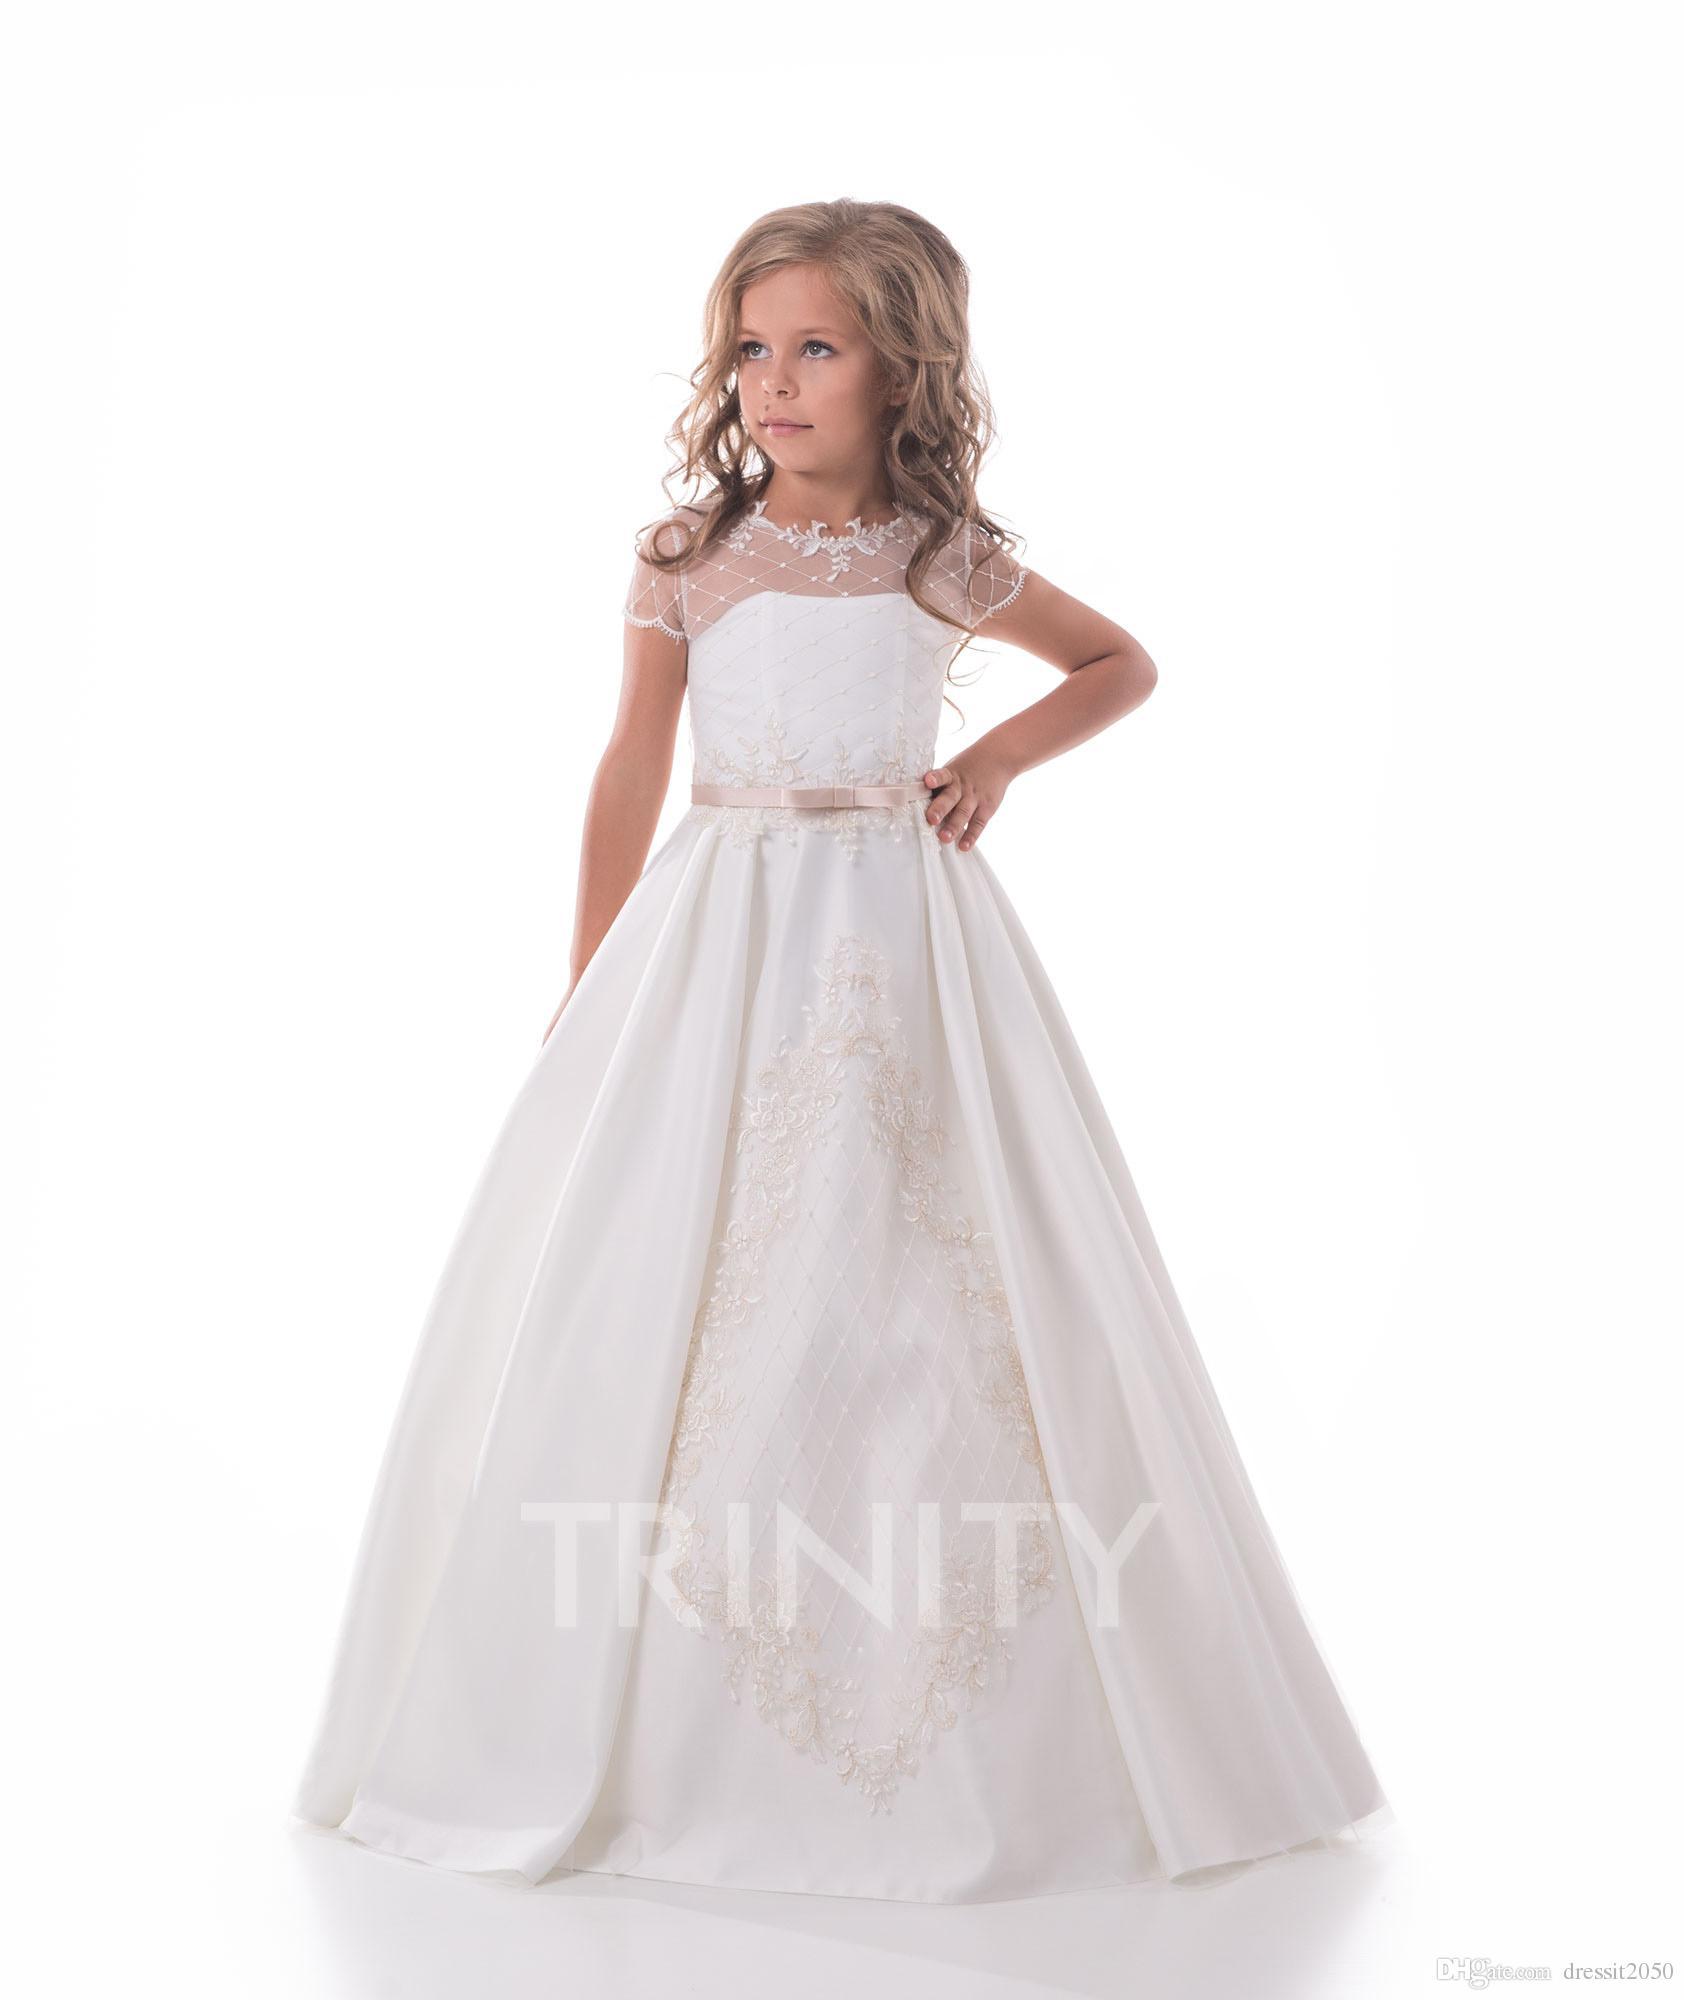 GIRLS CHILDREN GLITZ NATIONAL PAGEANT LONG DRESS Formal Wedding Party sz 3-14